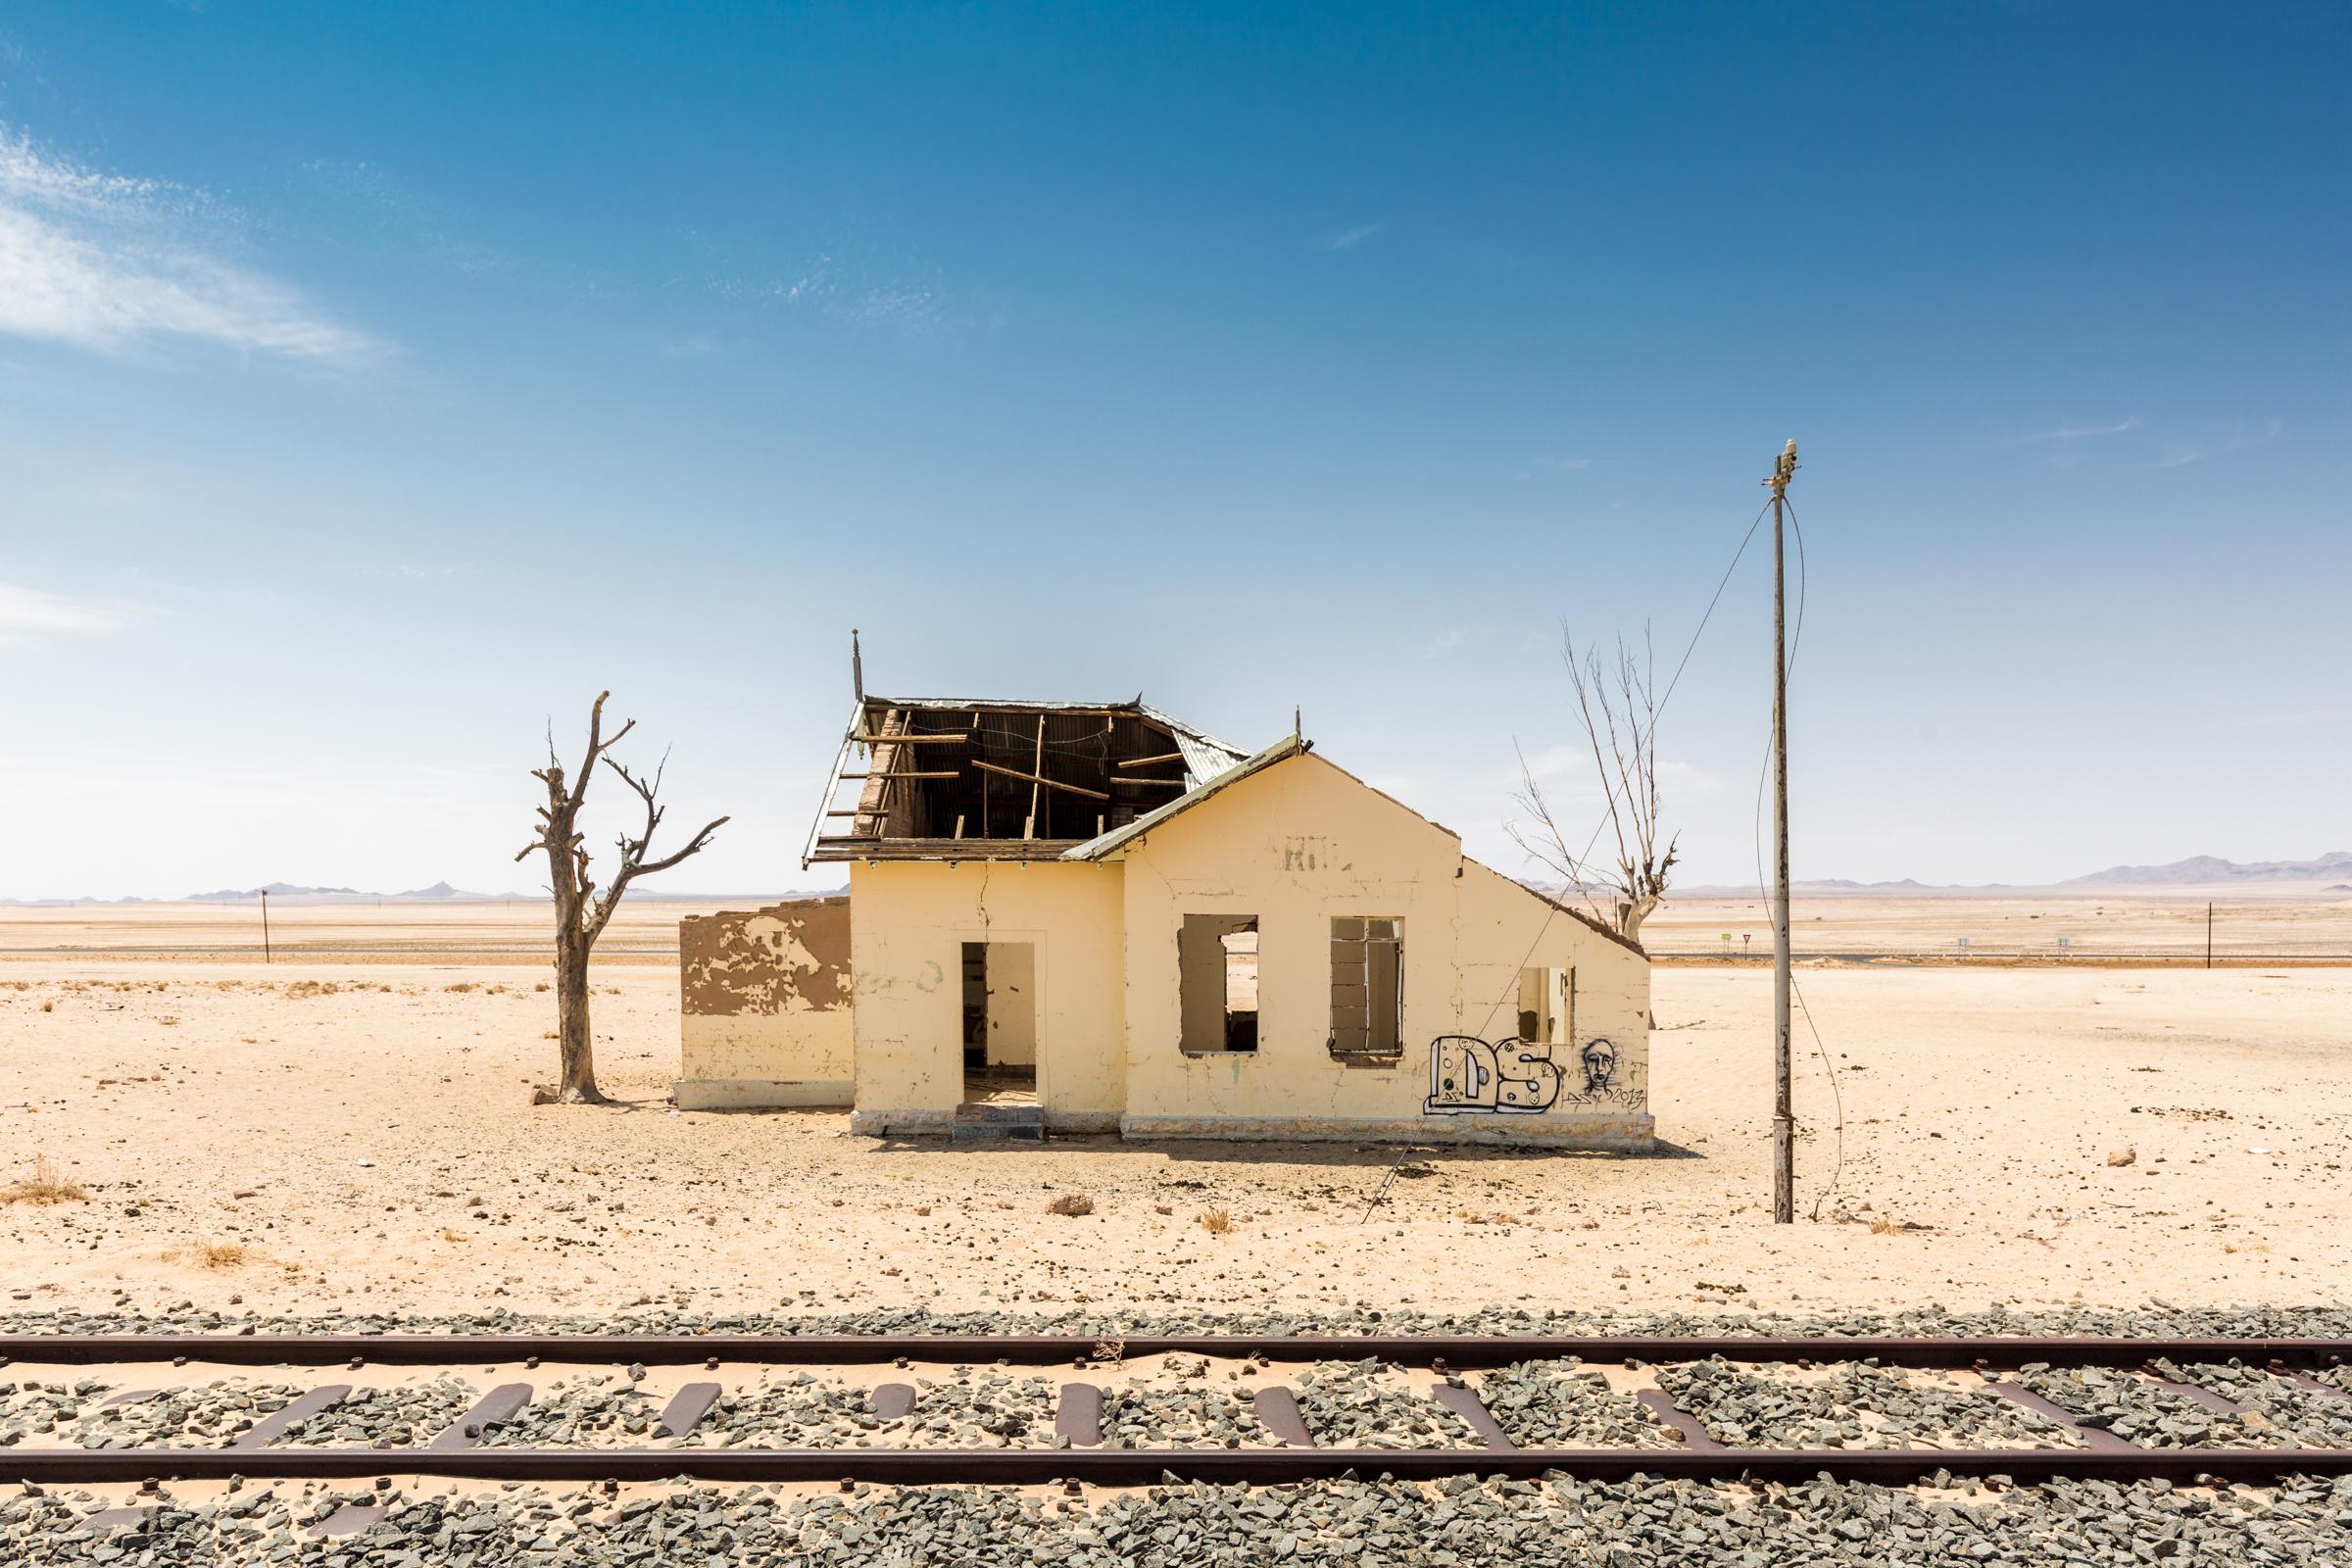 NAMIBIA    LOCATION:   NAMIBIA